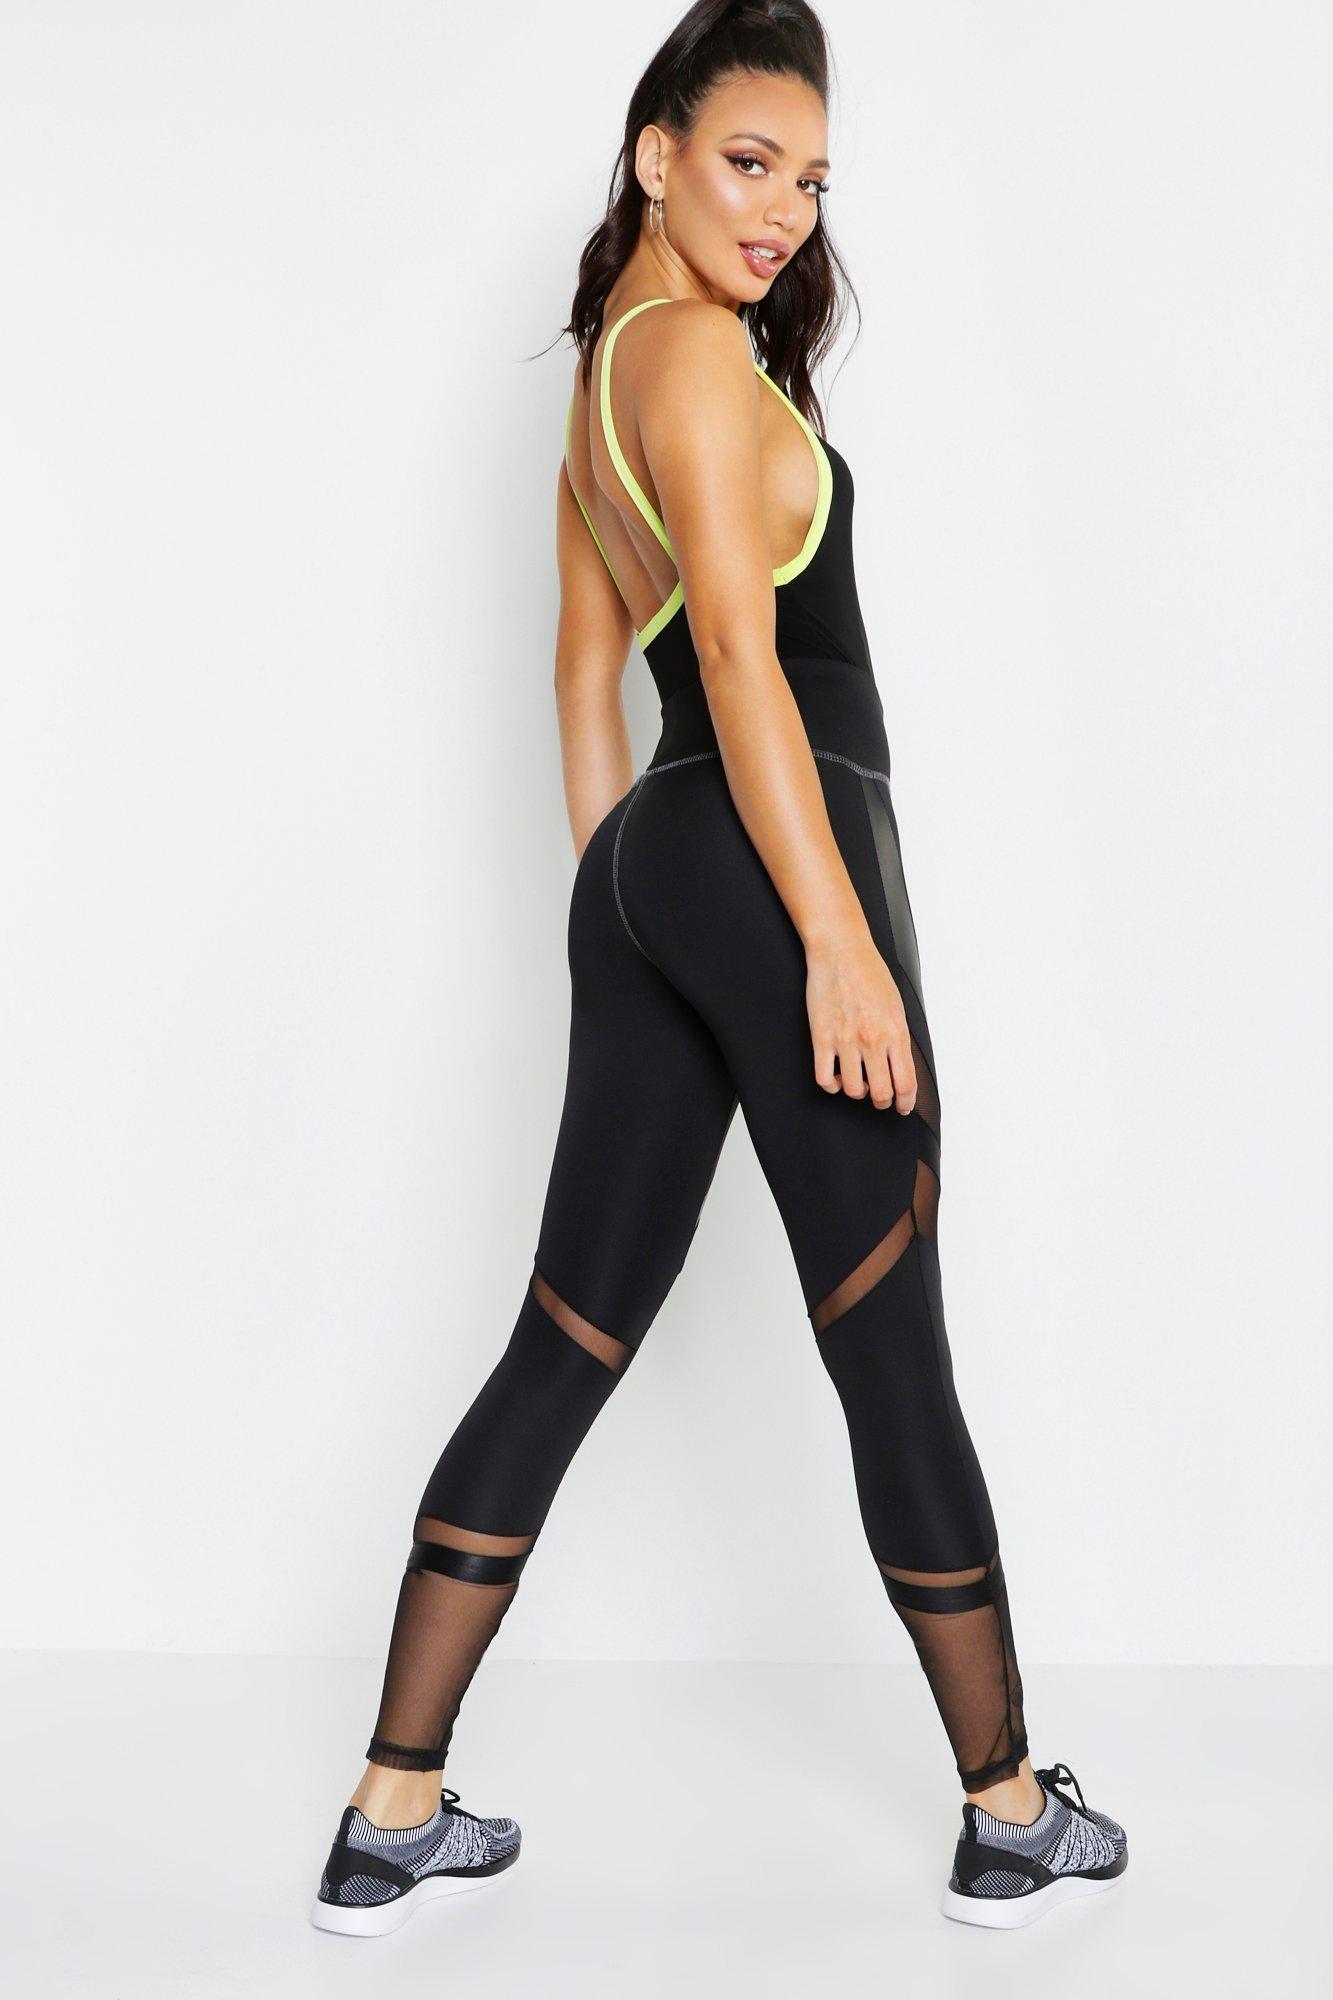 7f3fbfd361c0 Boohoo - Black Fit Premium Curved Panel High Waist Legging - Lyst. View  fullscreen